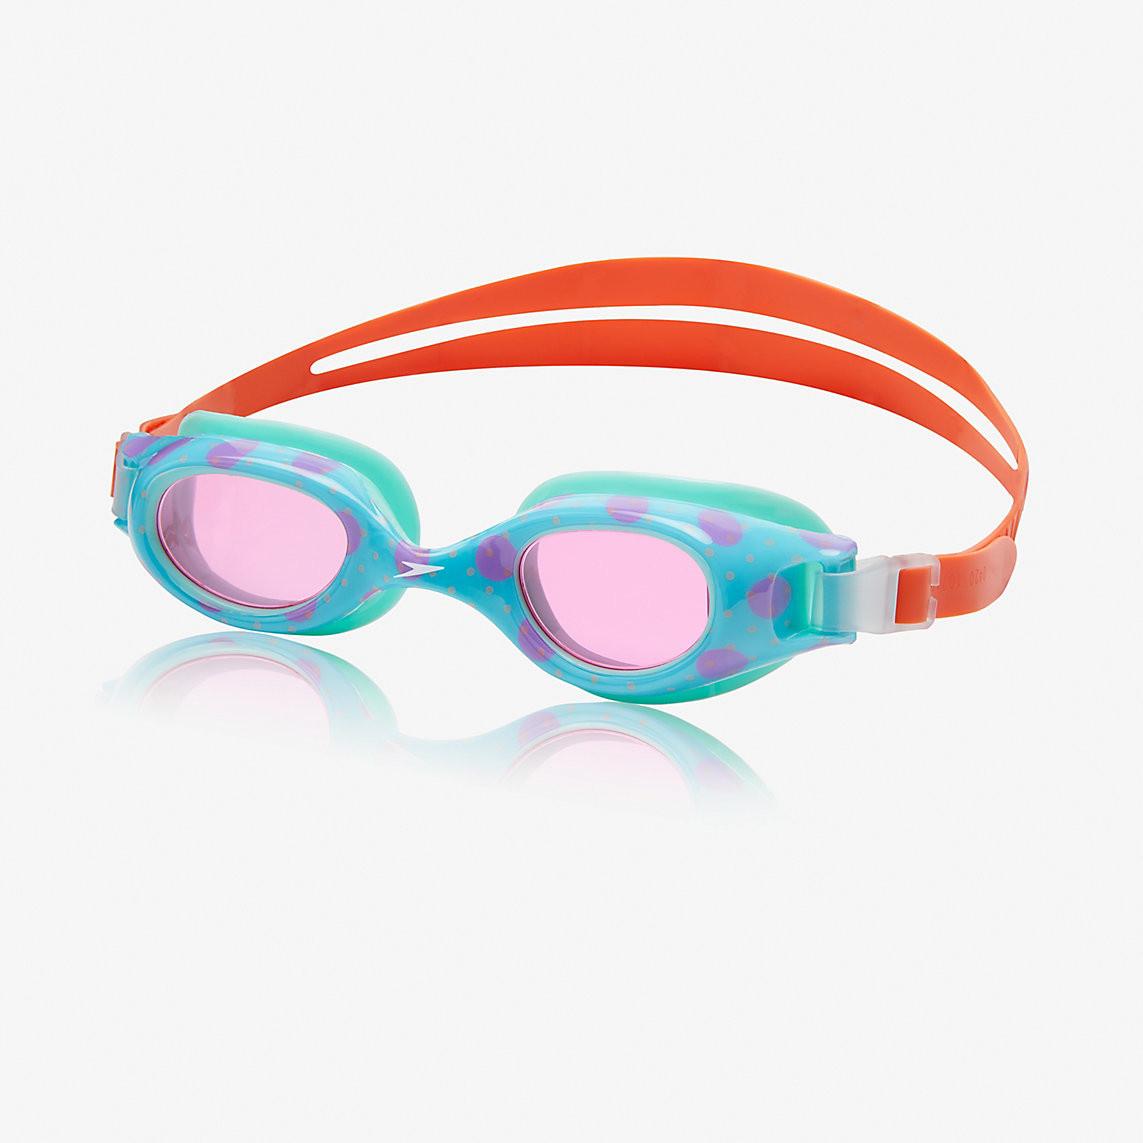 Speedo Jr. Hydrospex Print Goggle